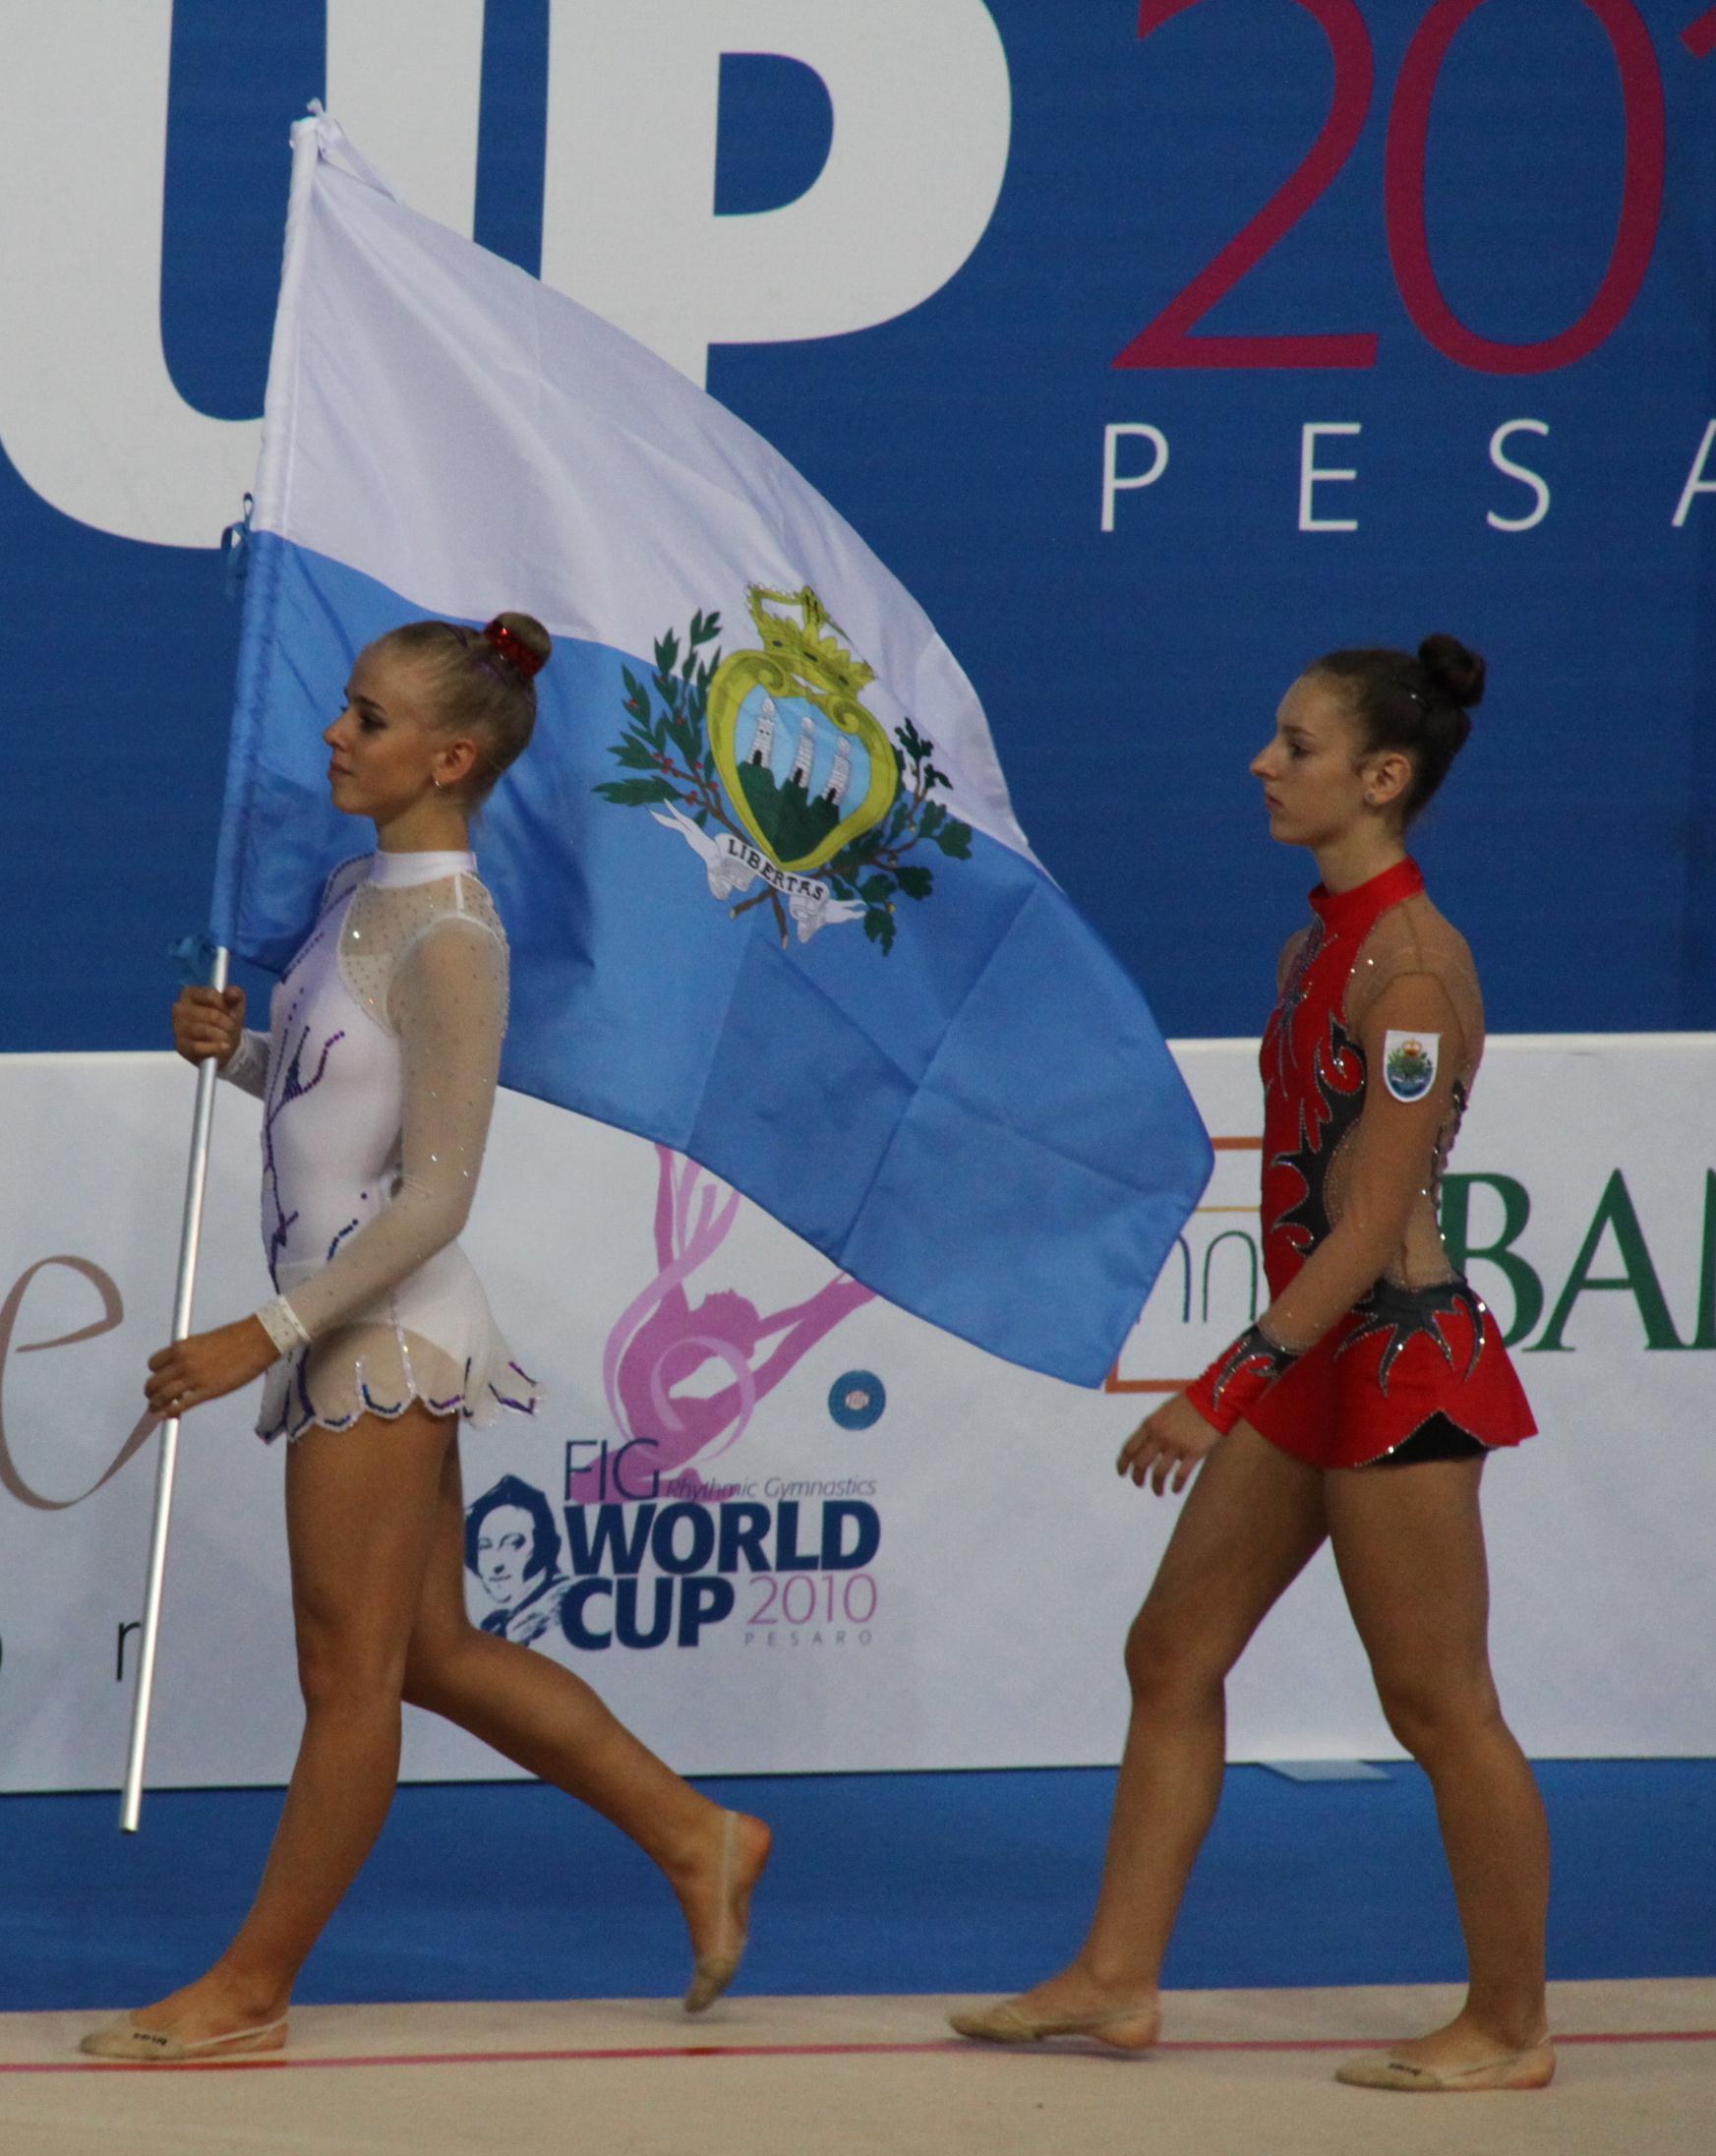 World Cup 2010 - Pesaro